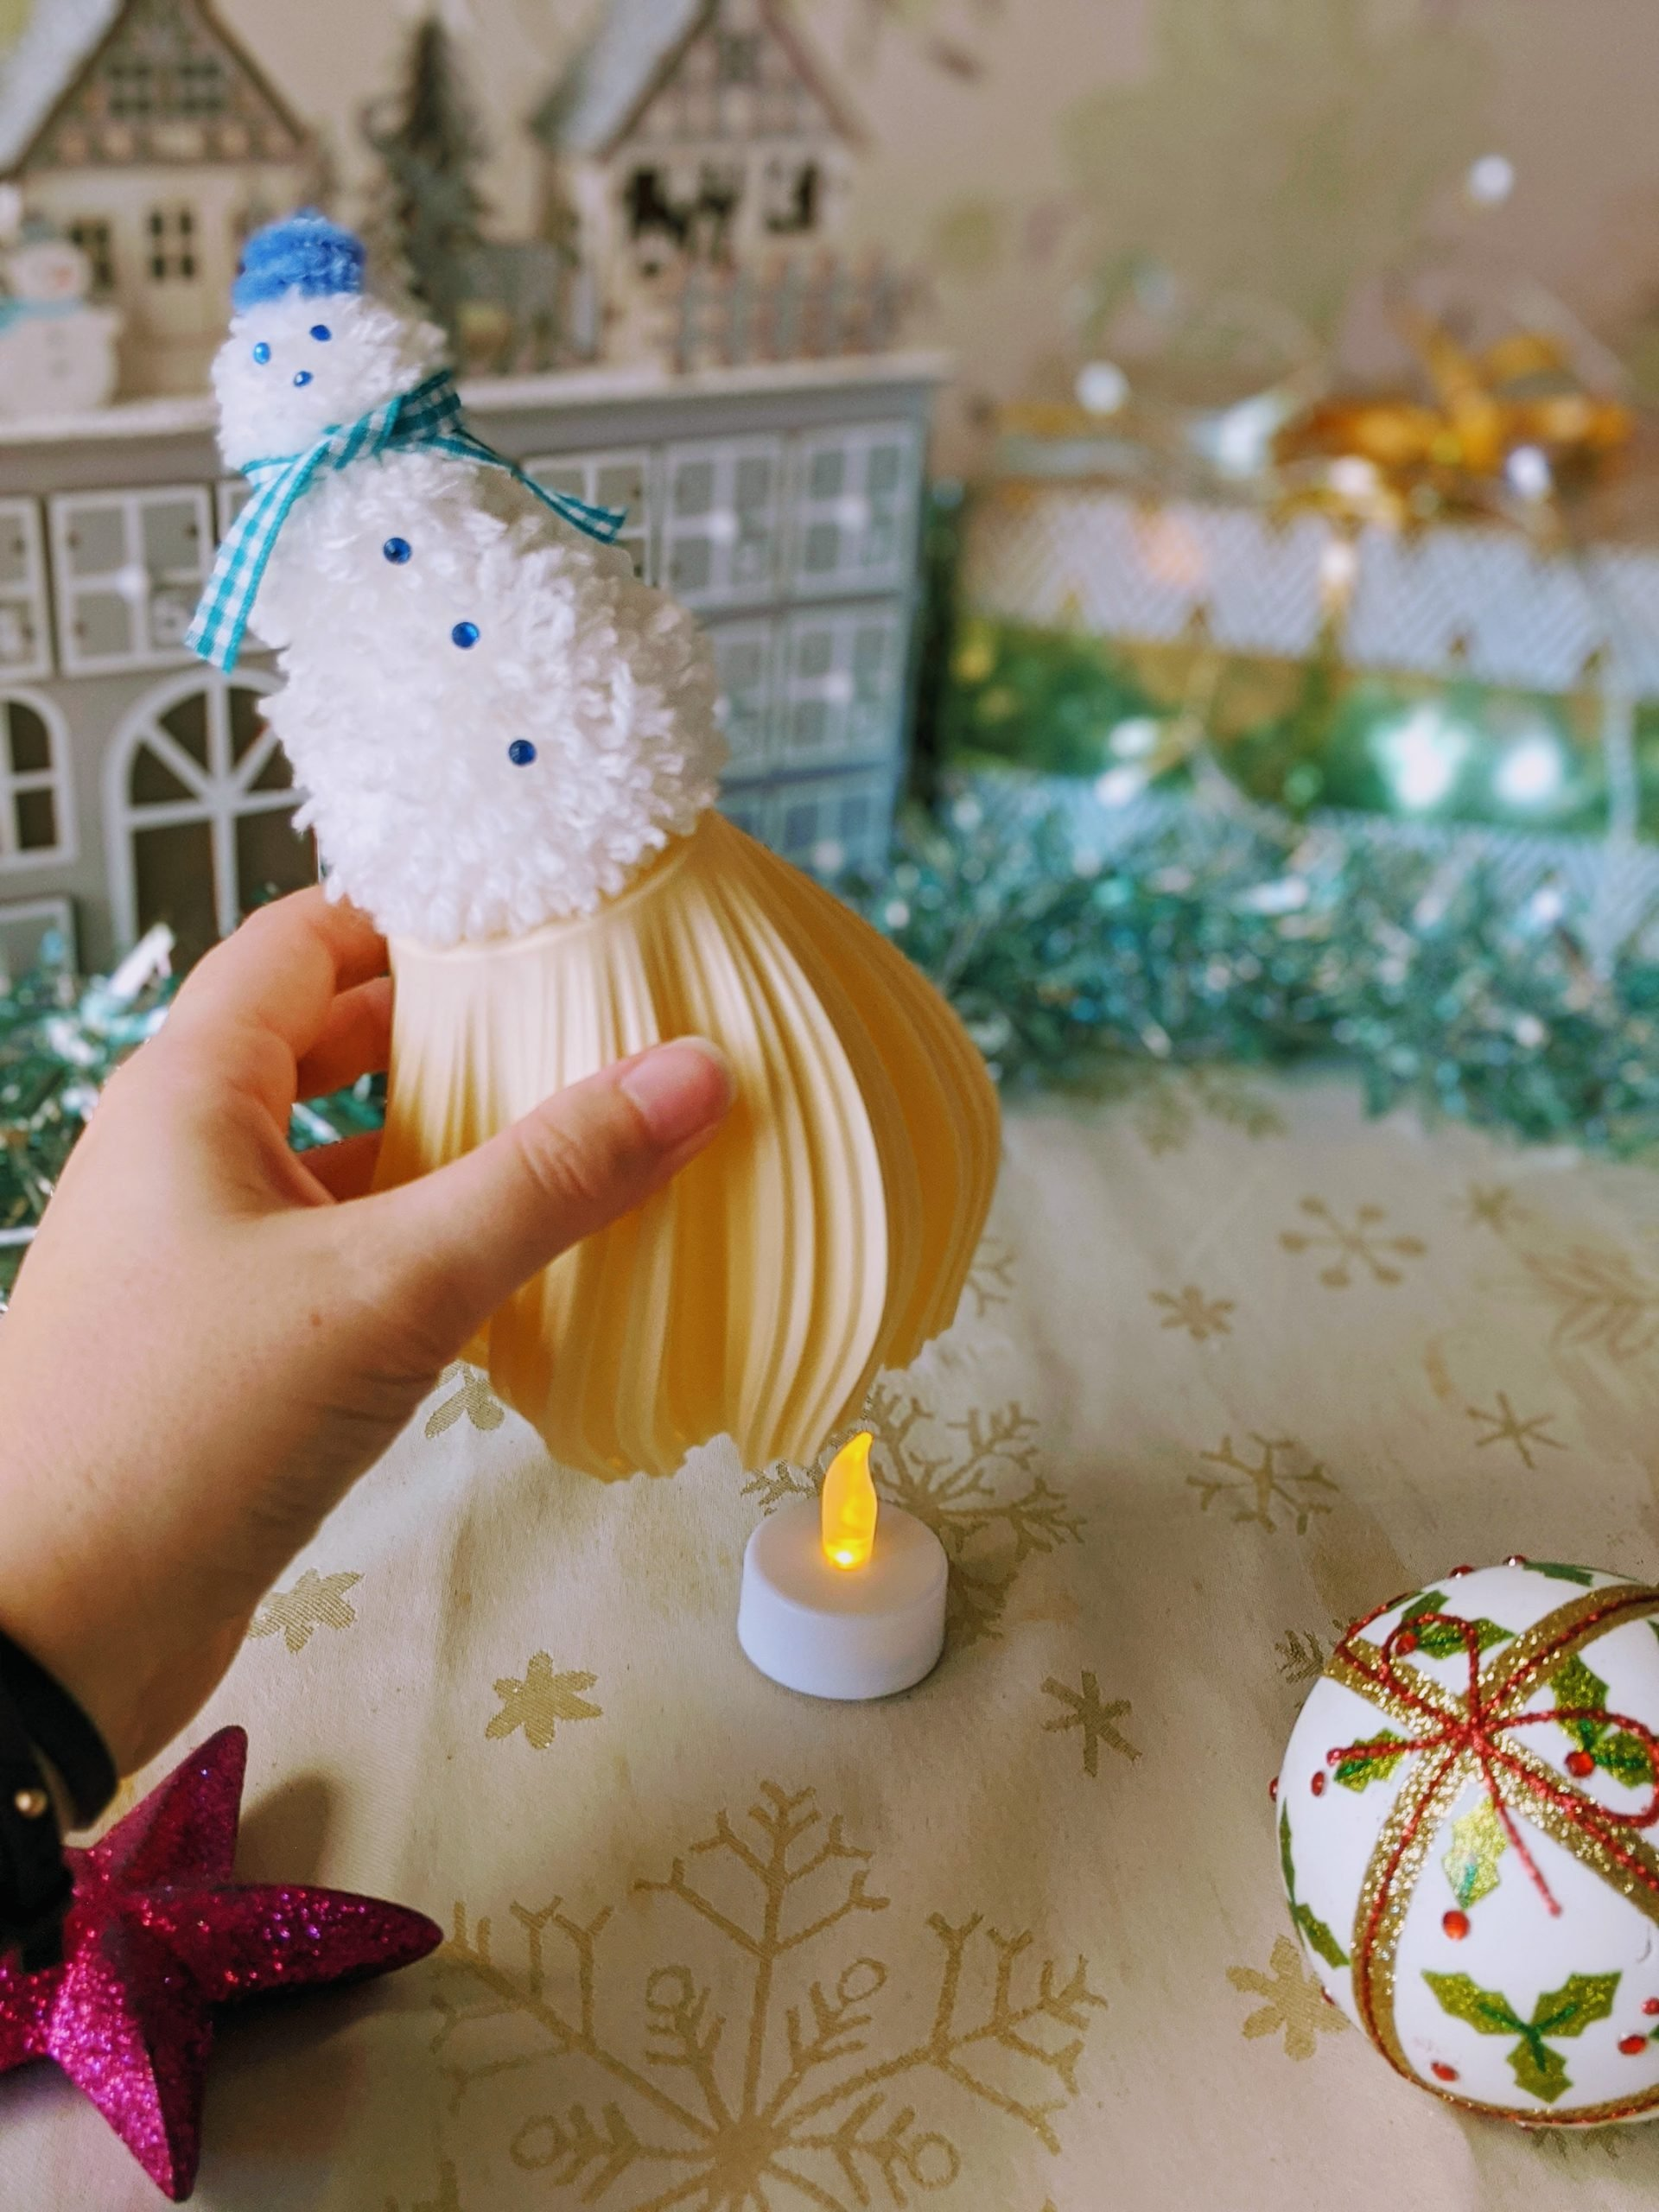 Flameless candle under pom pom snowman ornament